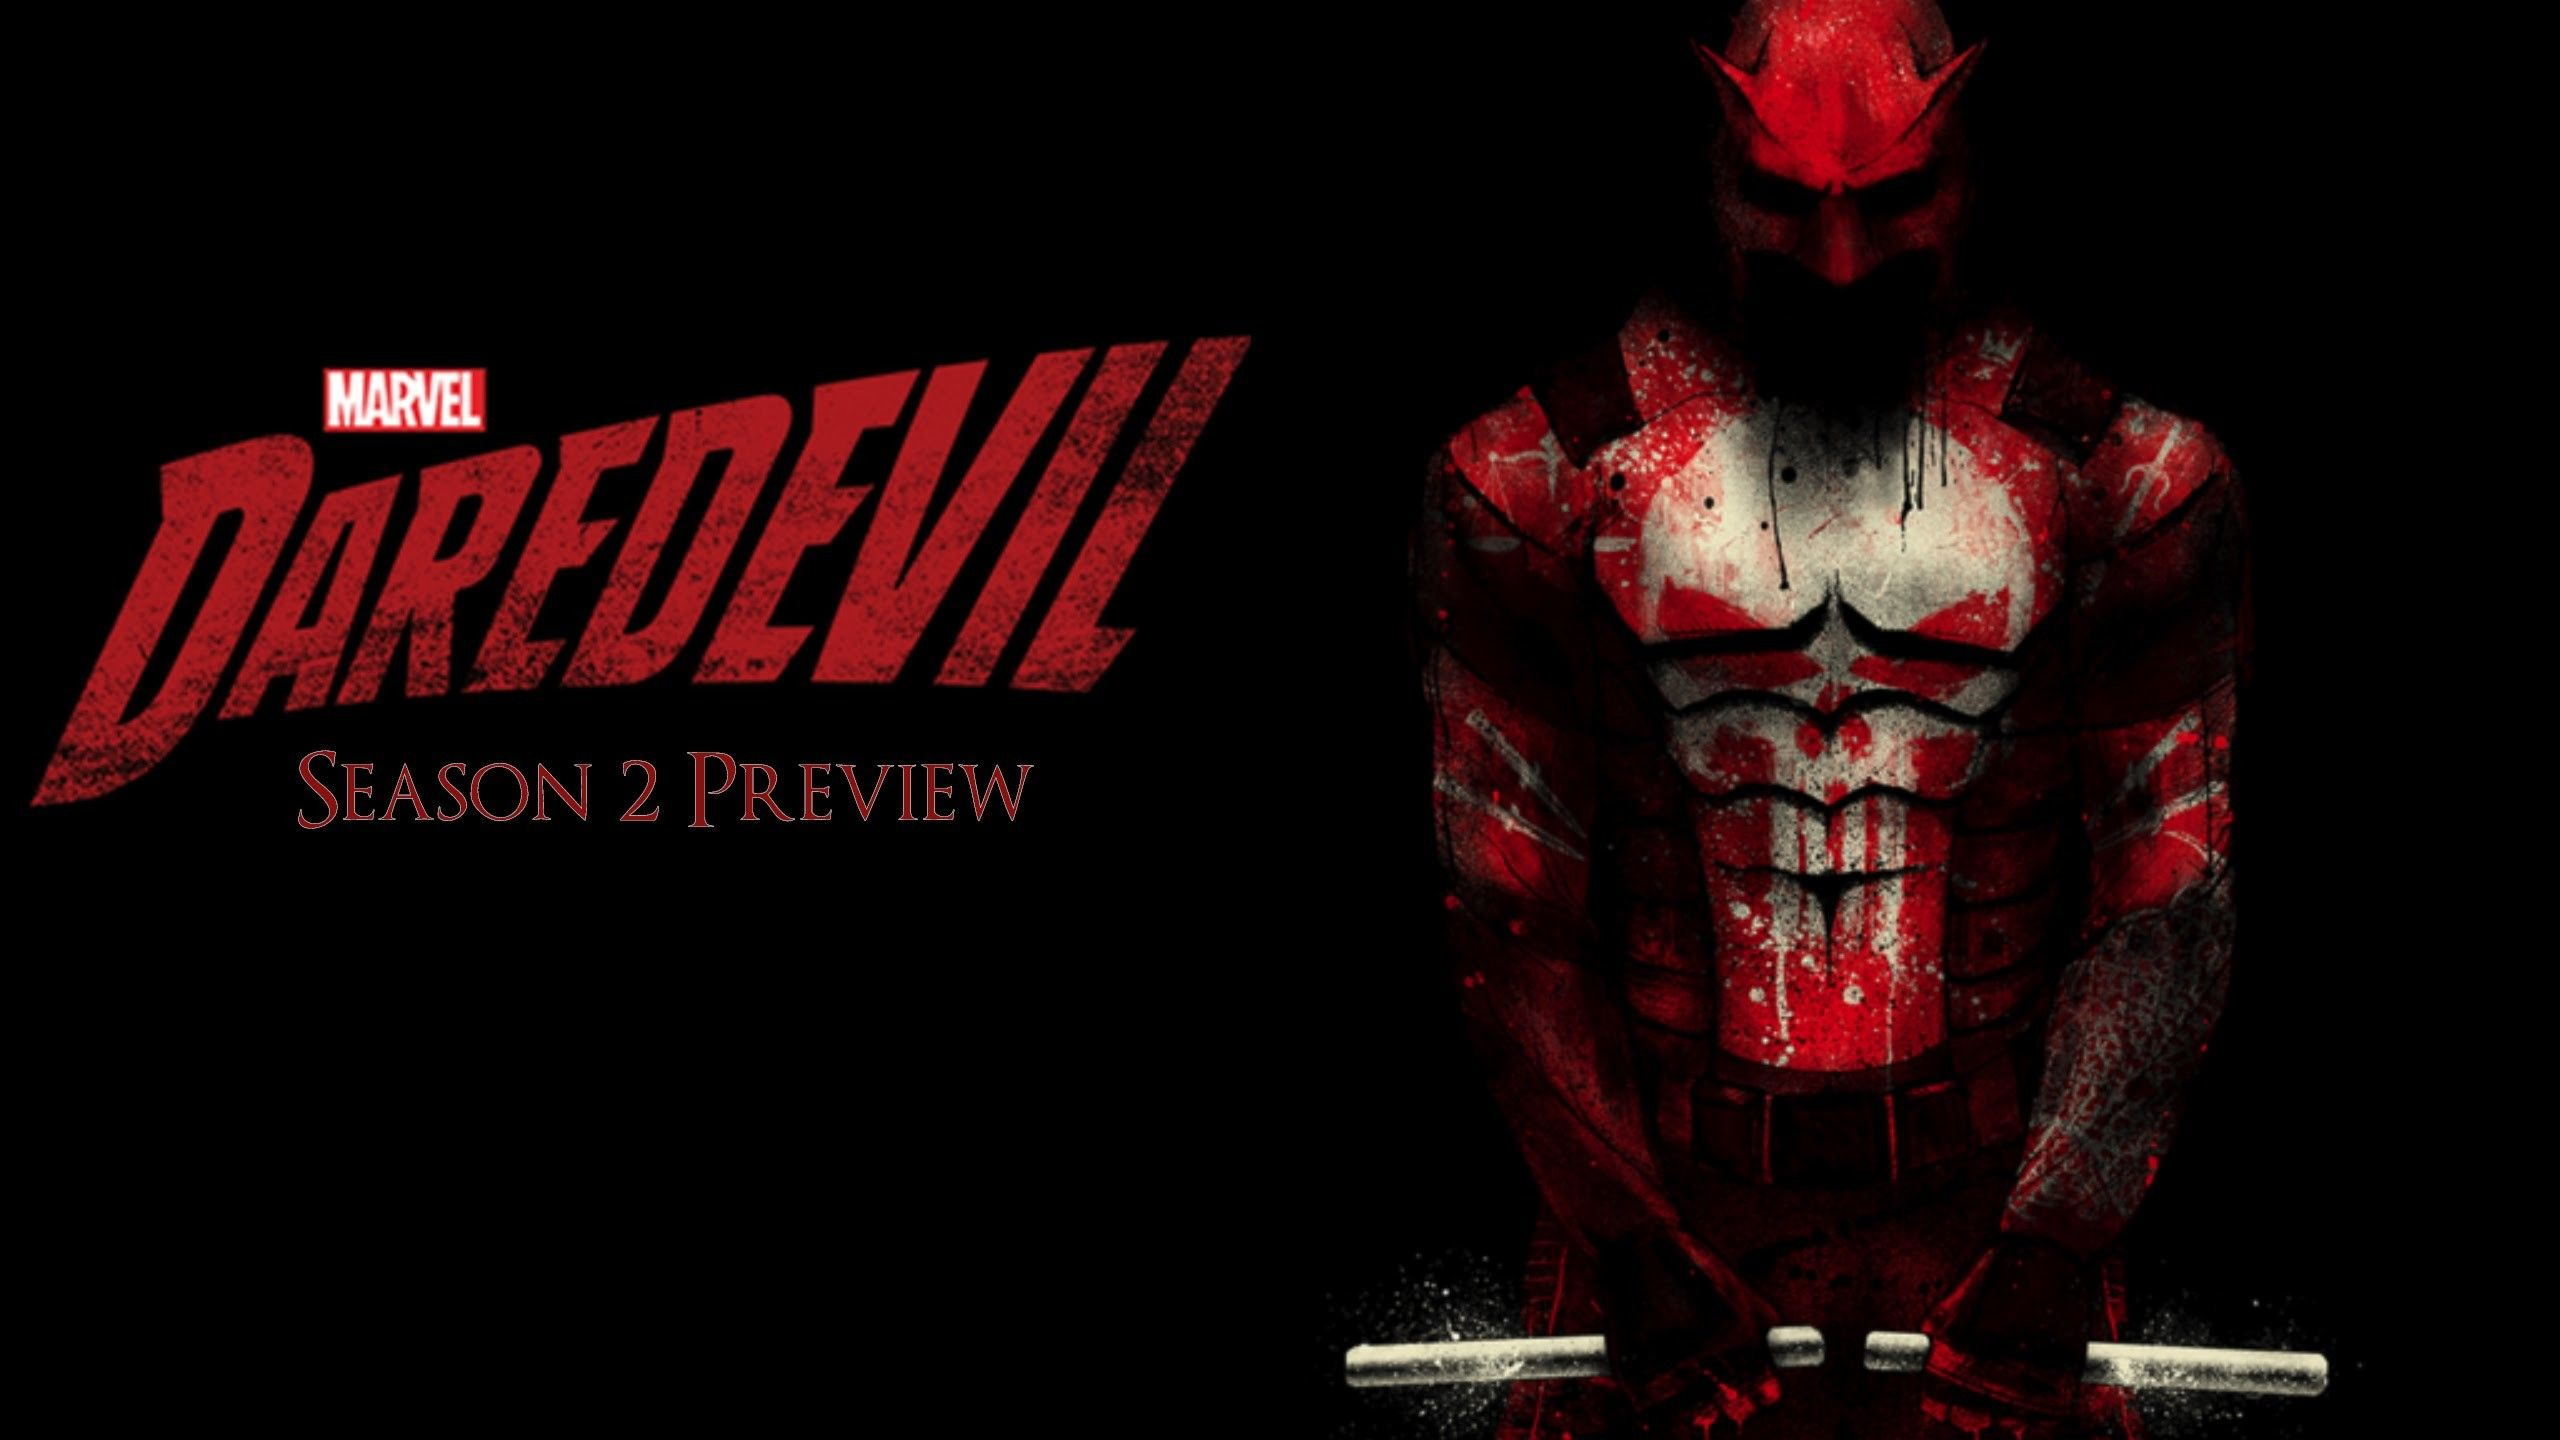 Daredevil Netflix Wallpapers Top Free Daredevil Netflix Backgrounds Wallpaperaccess